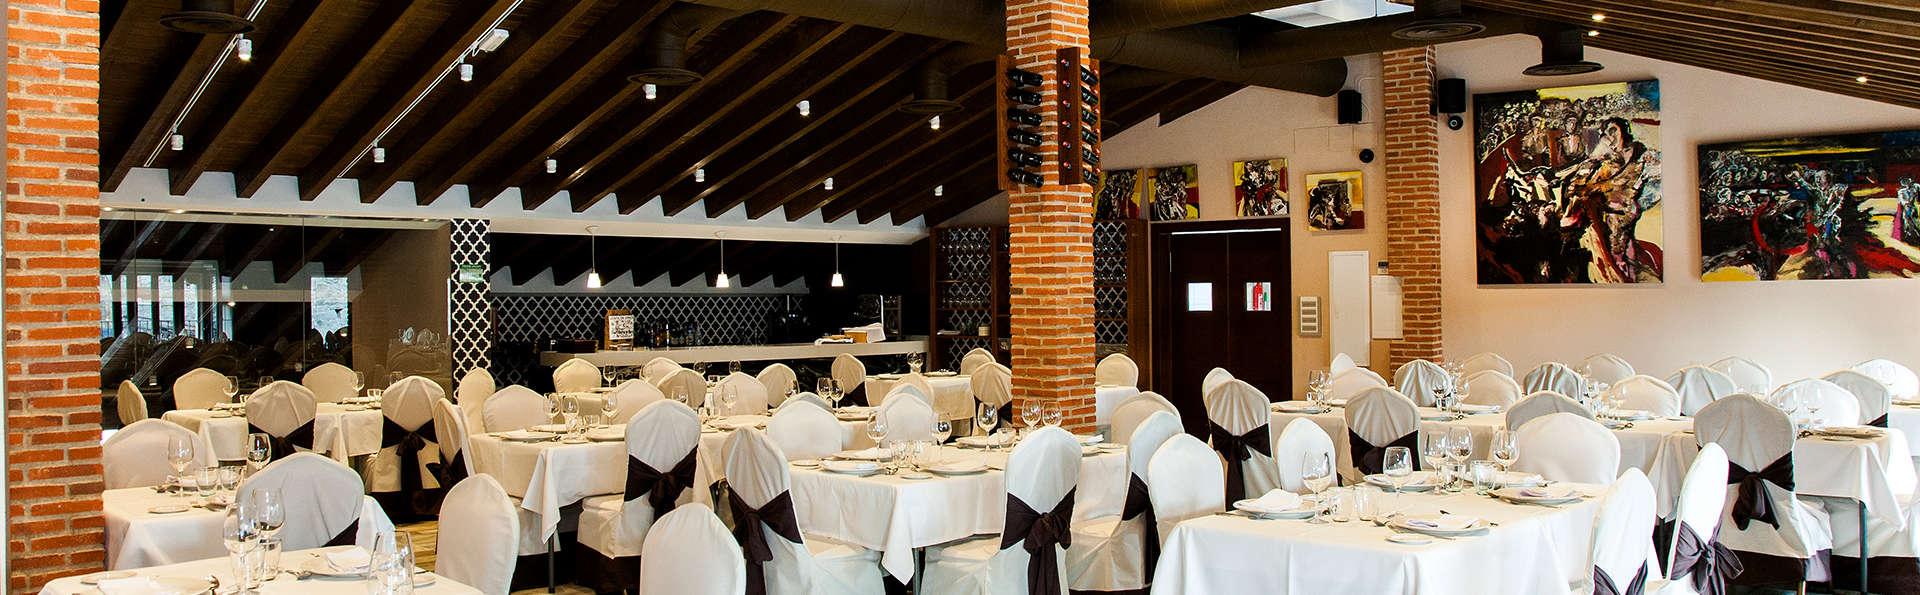 Abadía de San Martín - Edit_Restaurant4.jpg